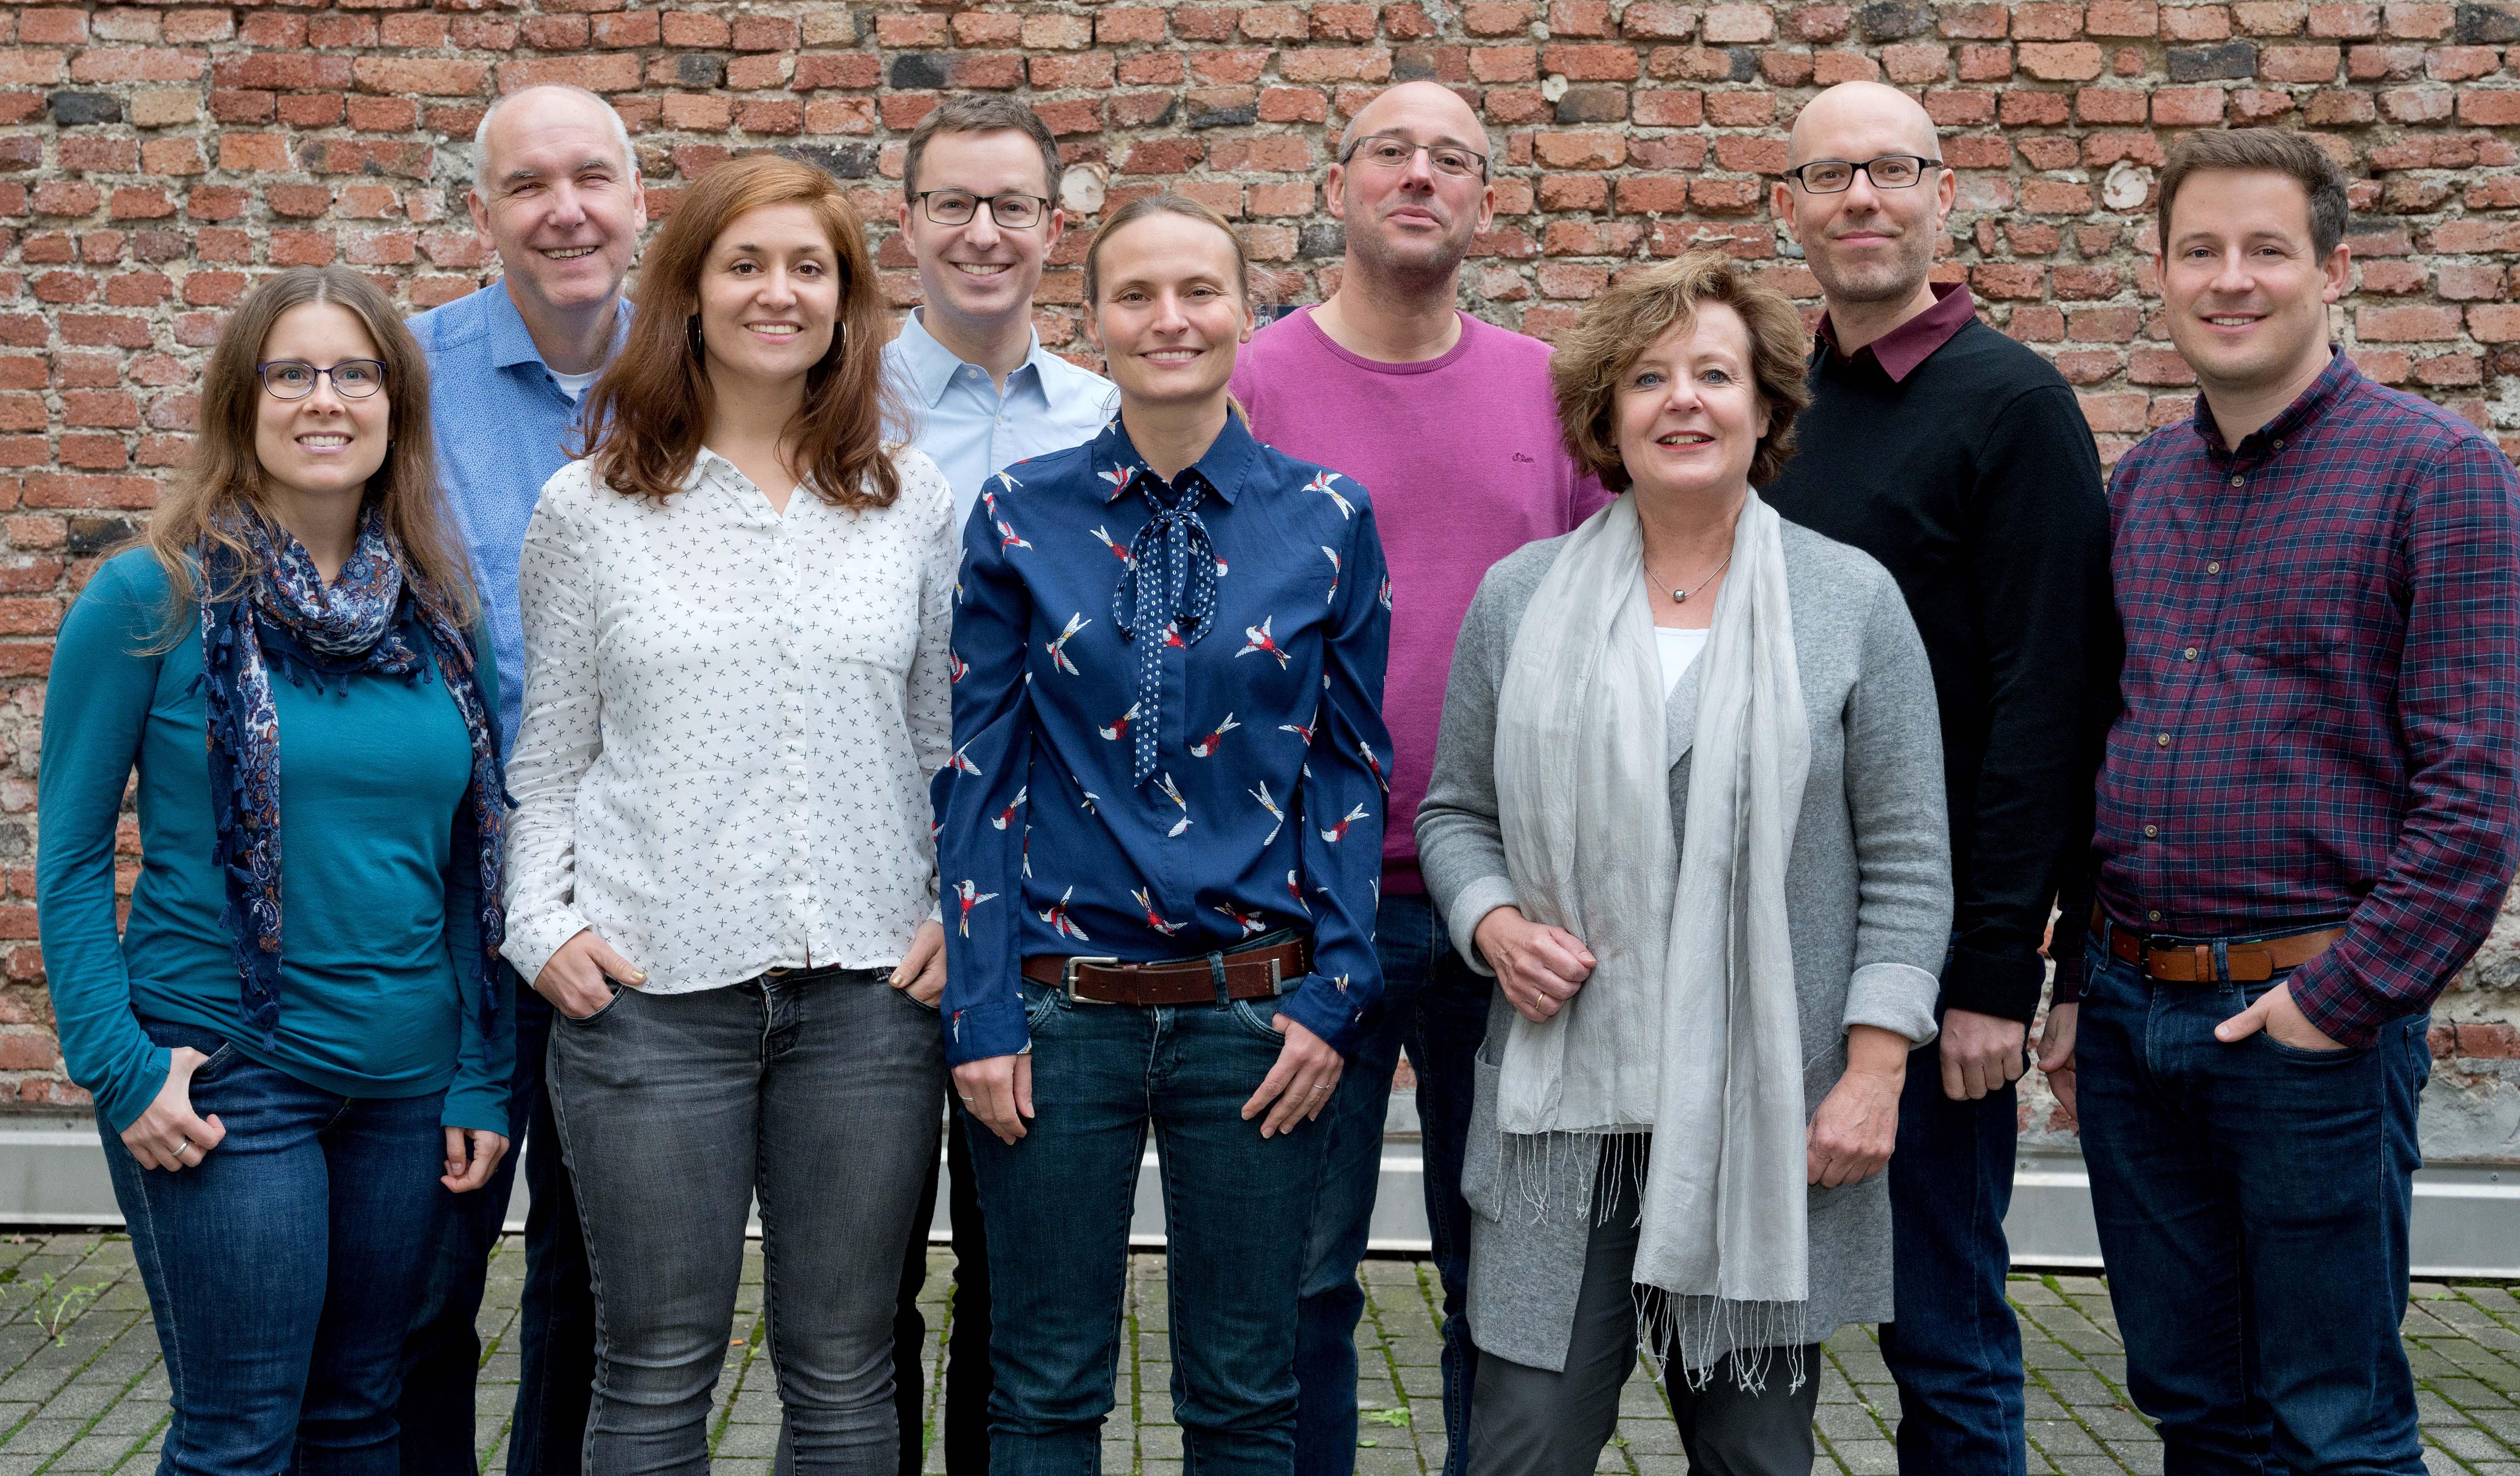 V.l.n.r.: Michaela Bode (et), Dr. Karl Weber (AKSB), Rebecca Arbter (AdB), David Brixius (AKSB), Hanna Lorenzen (et), Sebastian Bock (AdB), Barbara Menke (bap/AL), Mark Medebach (et), Ole Jantschek (et). Foto: Anette Hammer